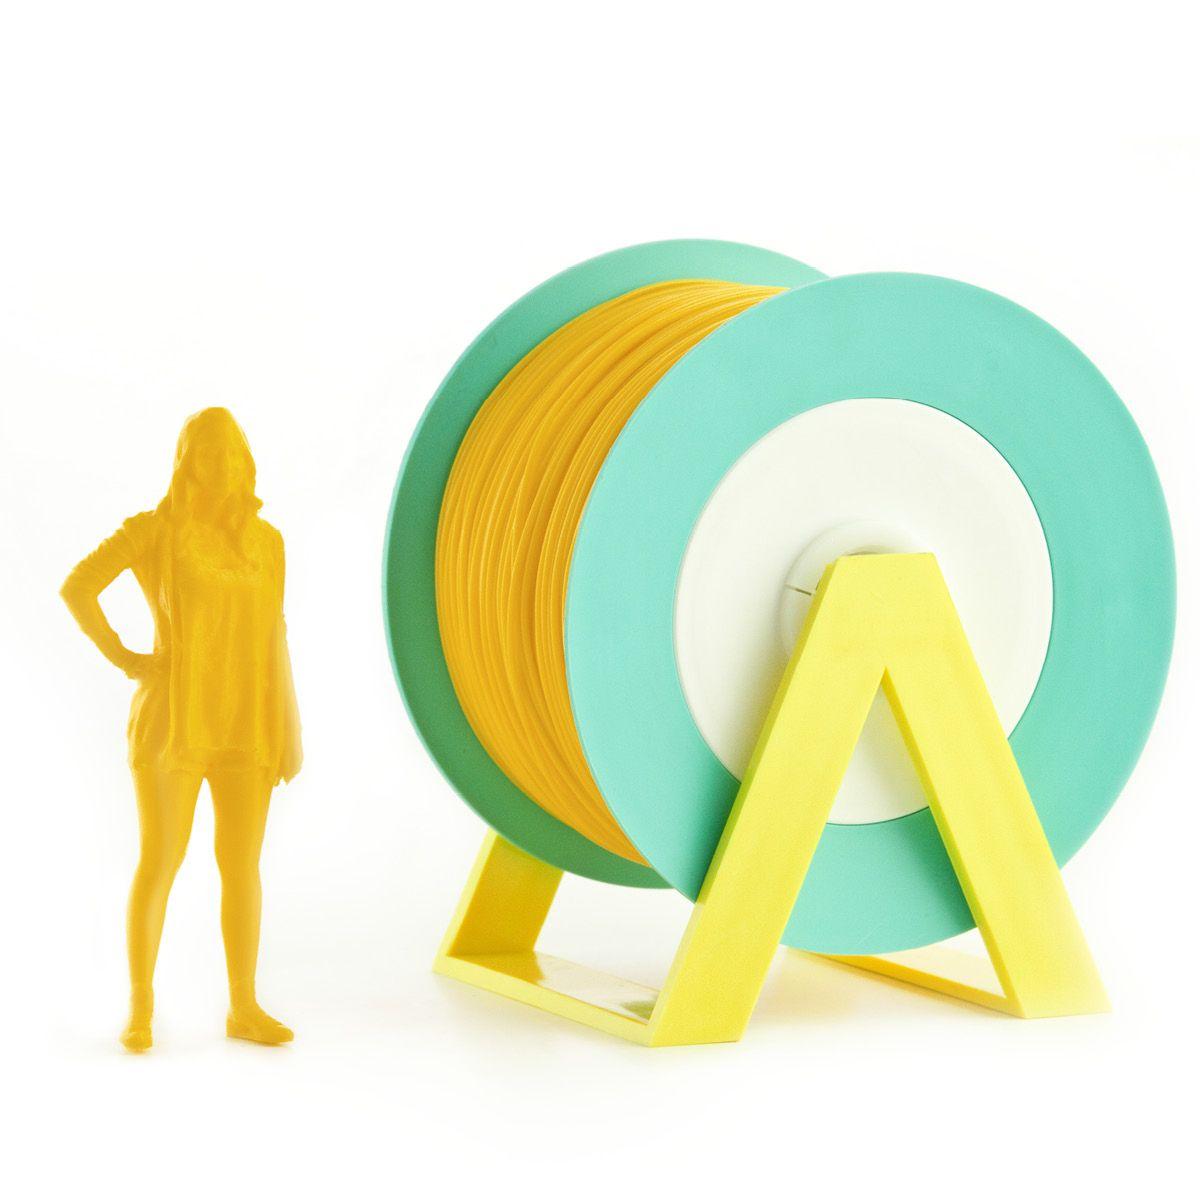 PLA Filament | Color: Tangerine Orange